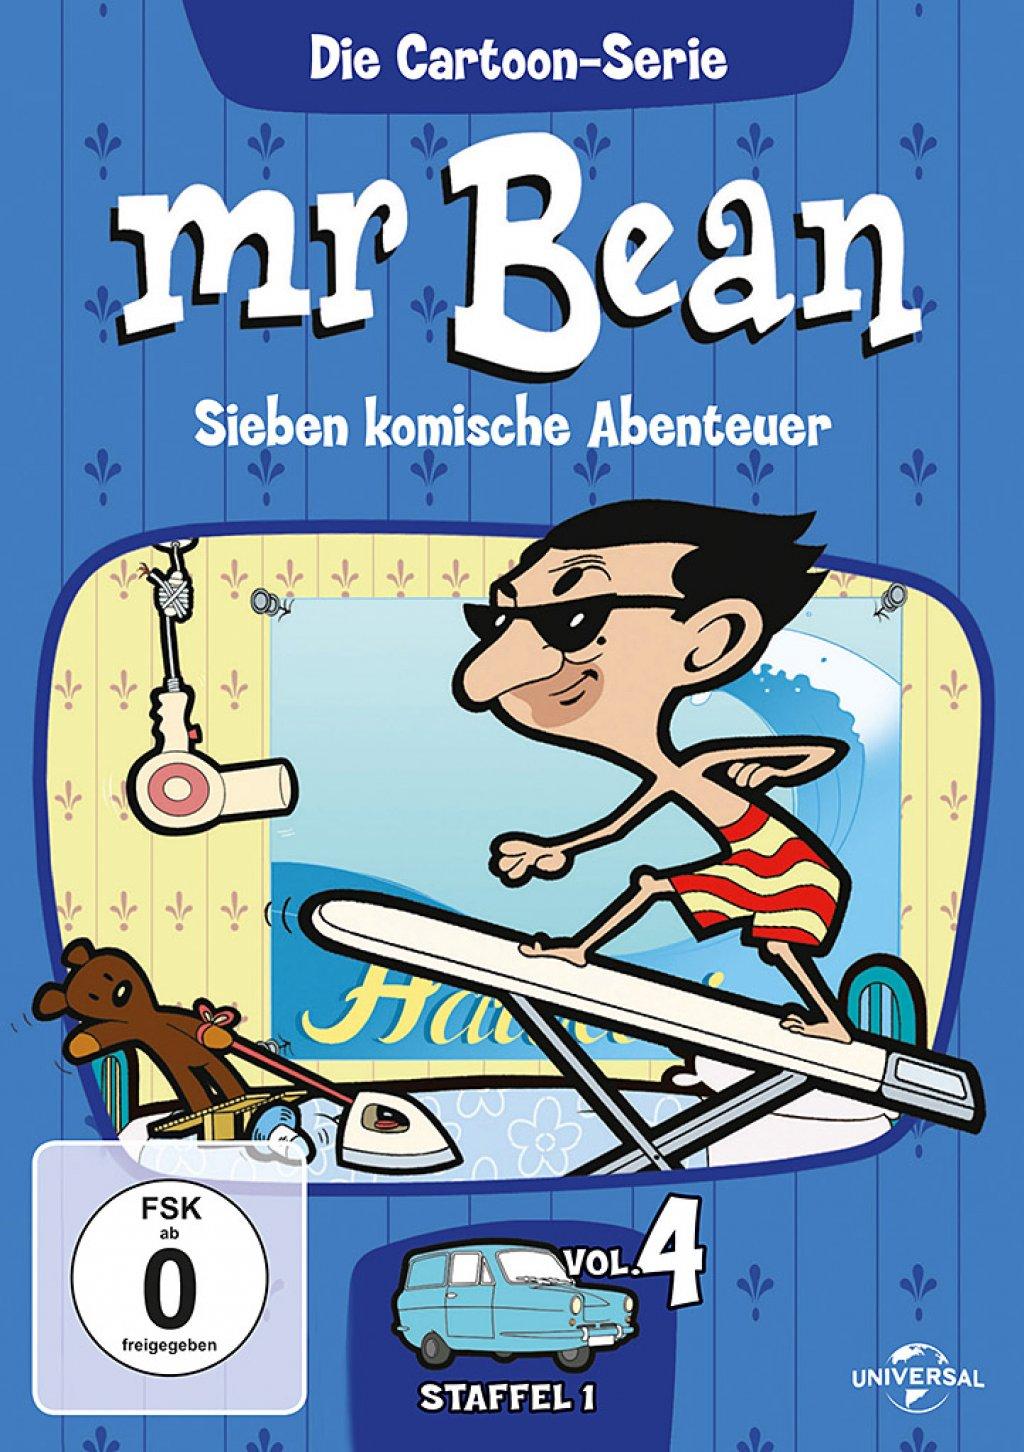 Mr. Bean - Die Cartoon Serie - Staffel 1 / Vol. 4 (DVD)